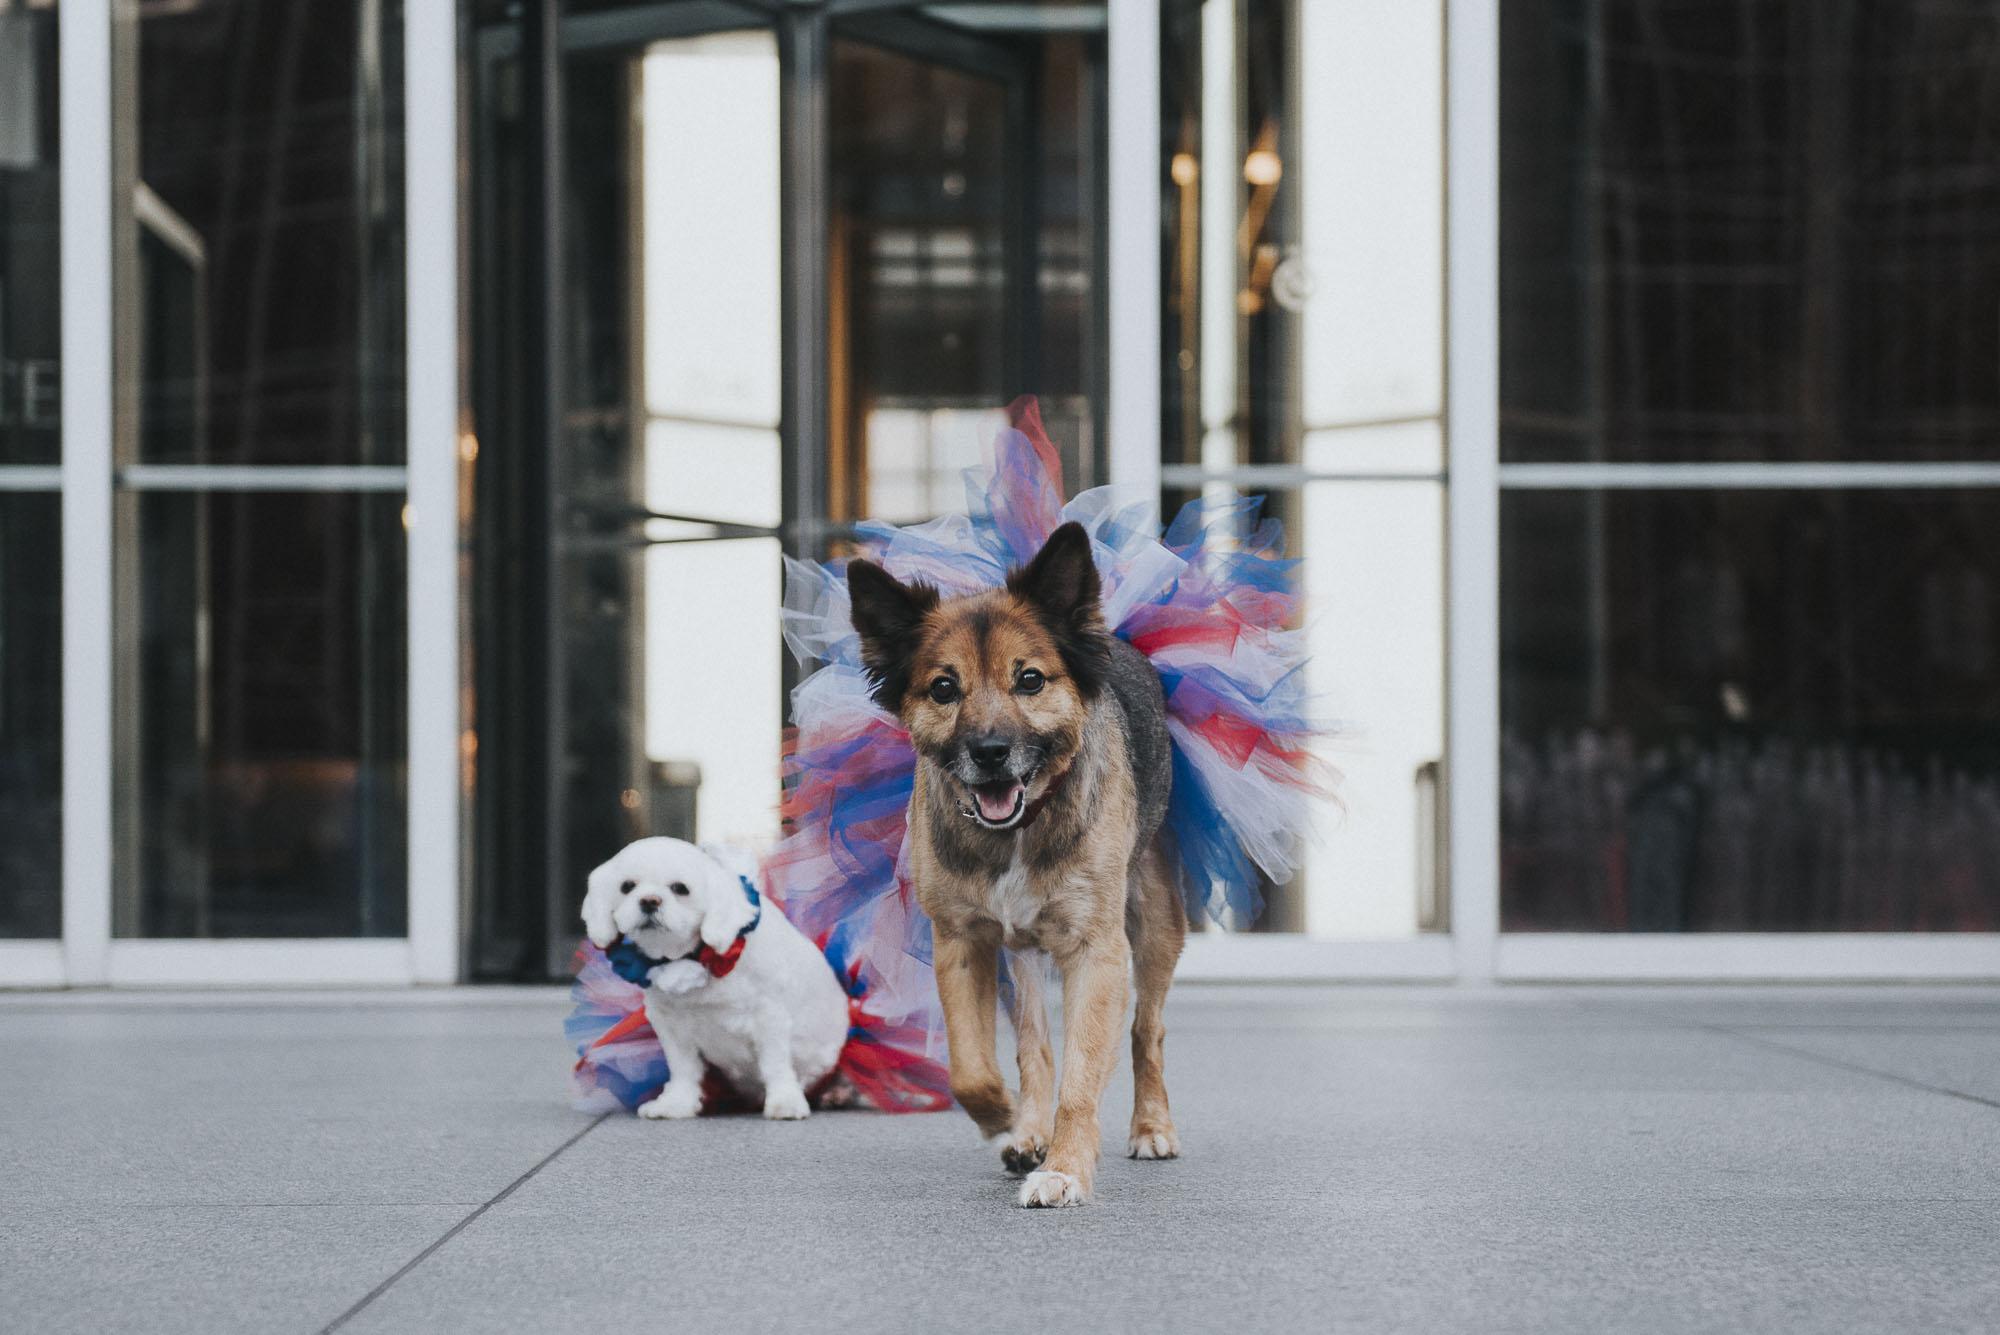 Dogs-ppg070144.JPG